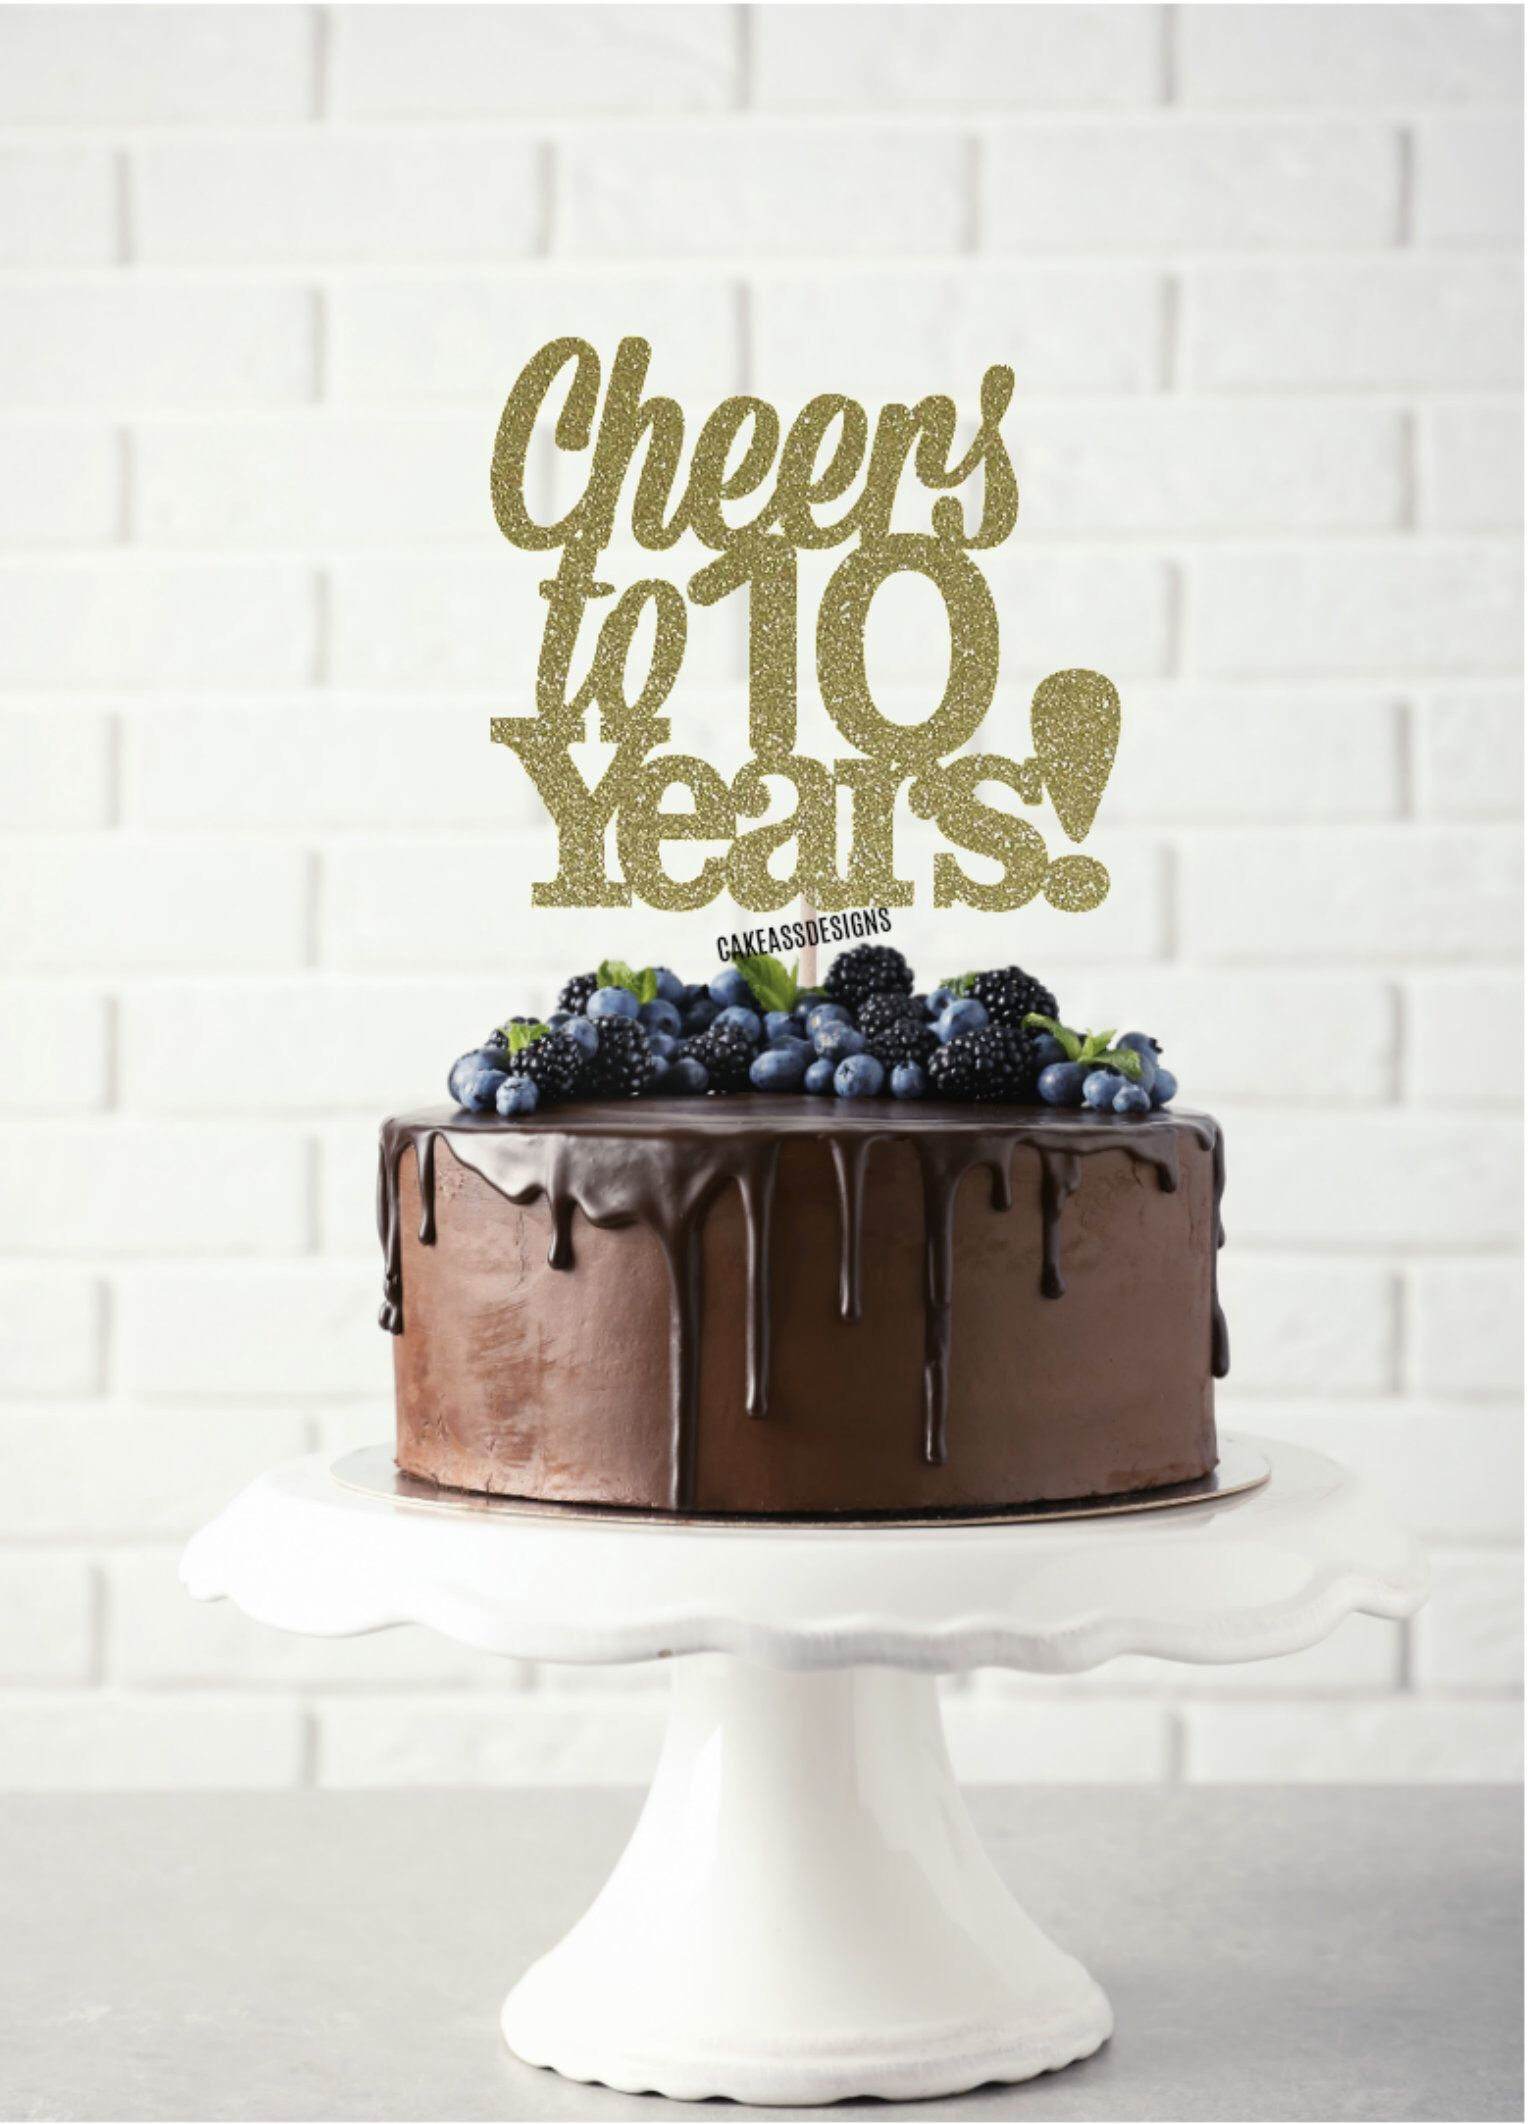 Name Cake Topper Glitter 10th Birthday. Personalized Birthday Cake Topper First Birthday Party Decor 5th Birthday Birthday Cake Sign